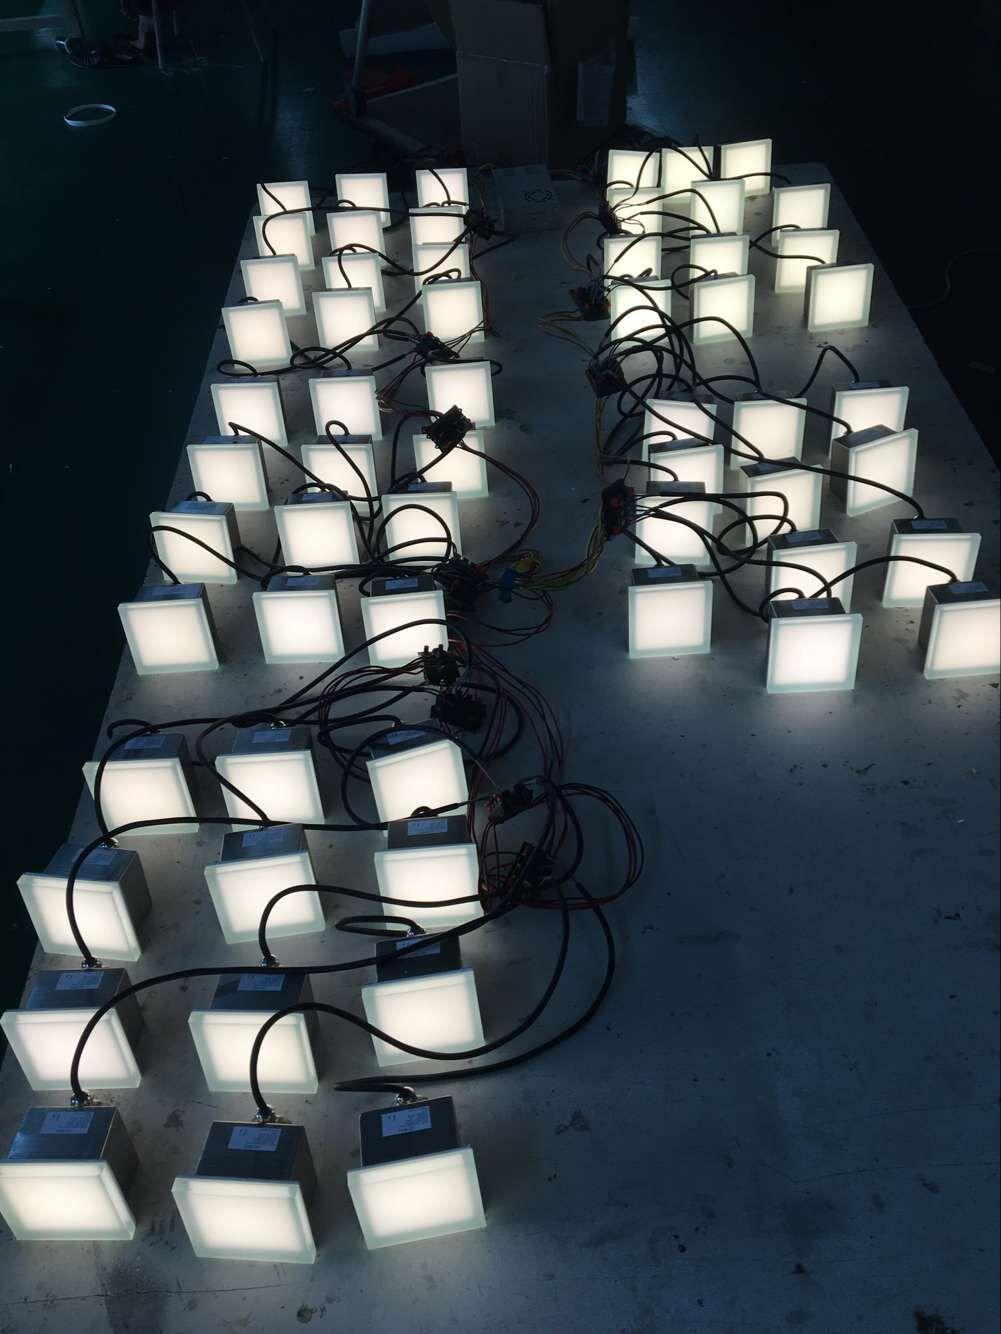 High Efficiency 12V 24V RGB Outdoor IP67 Waterproof LED Floor Tile Light 3